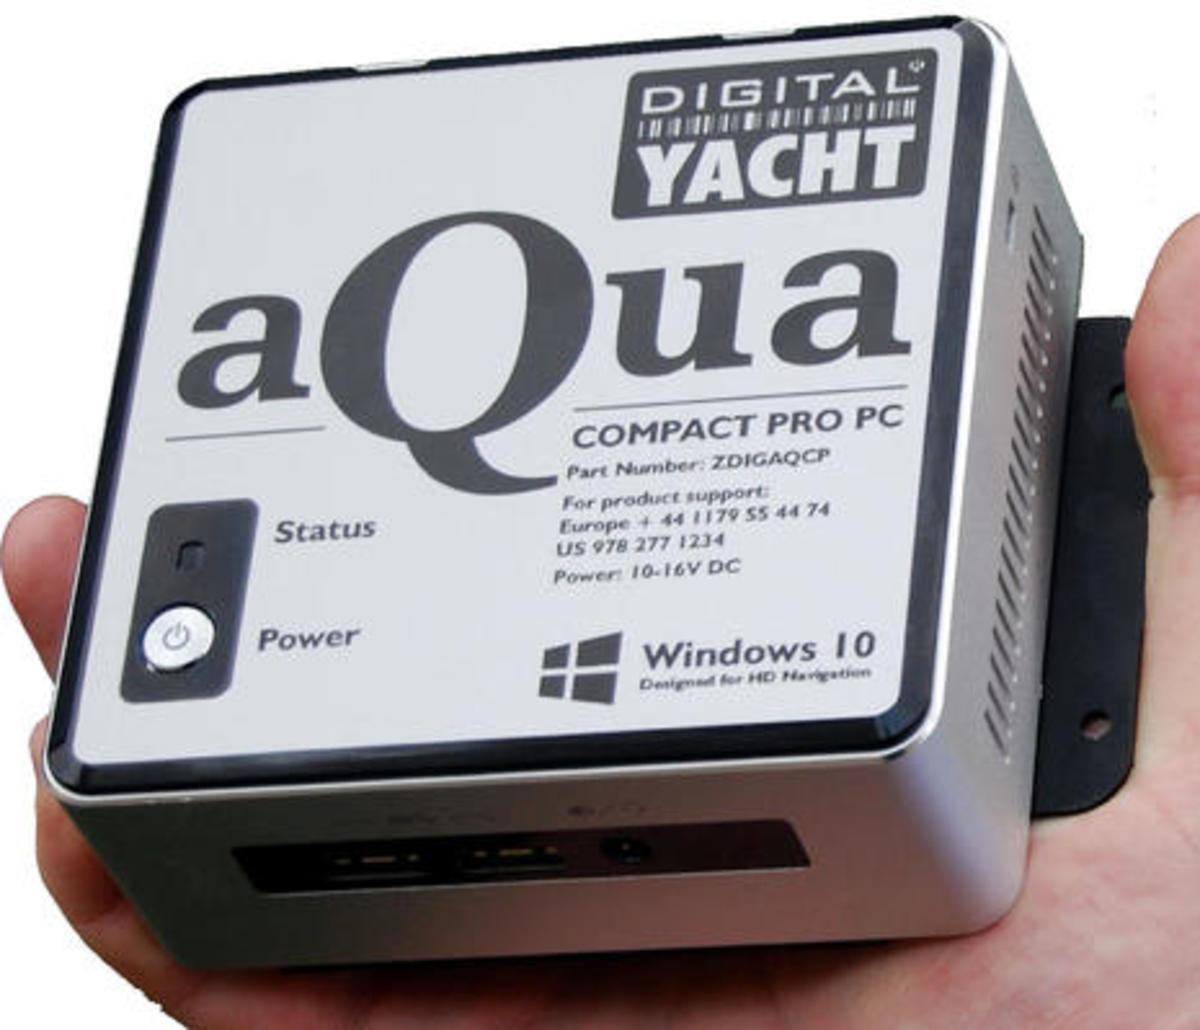 DY_Aqua_Compact_PC_aPanbo.jpg